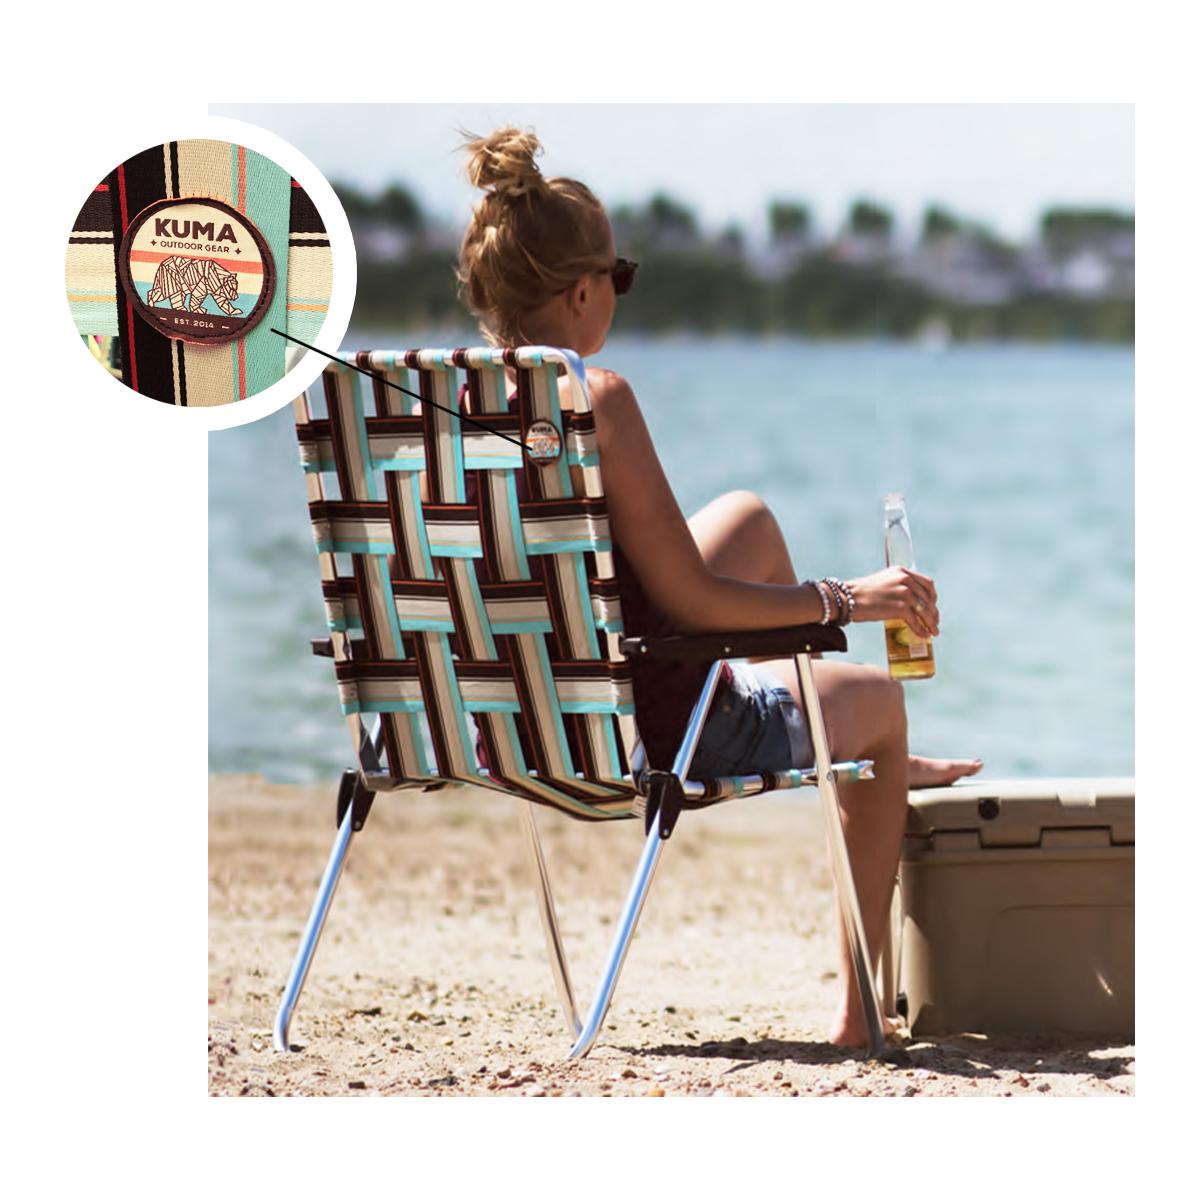 Retro Webbed Lawn Chairs Captiv8